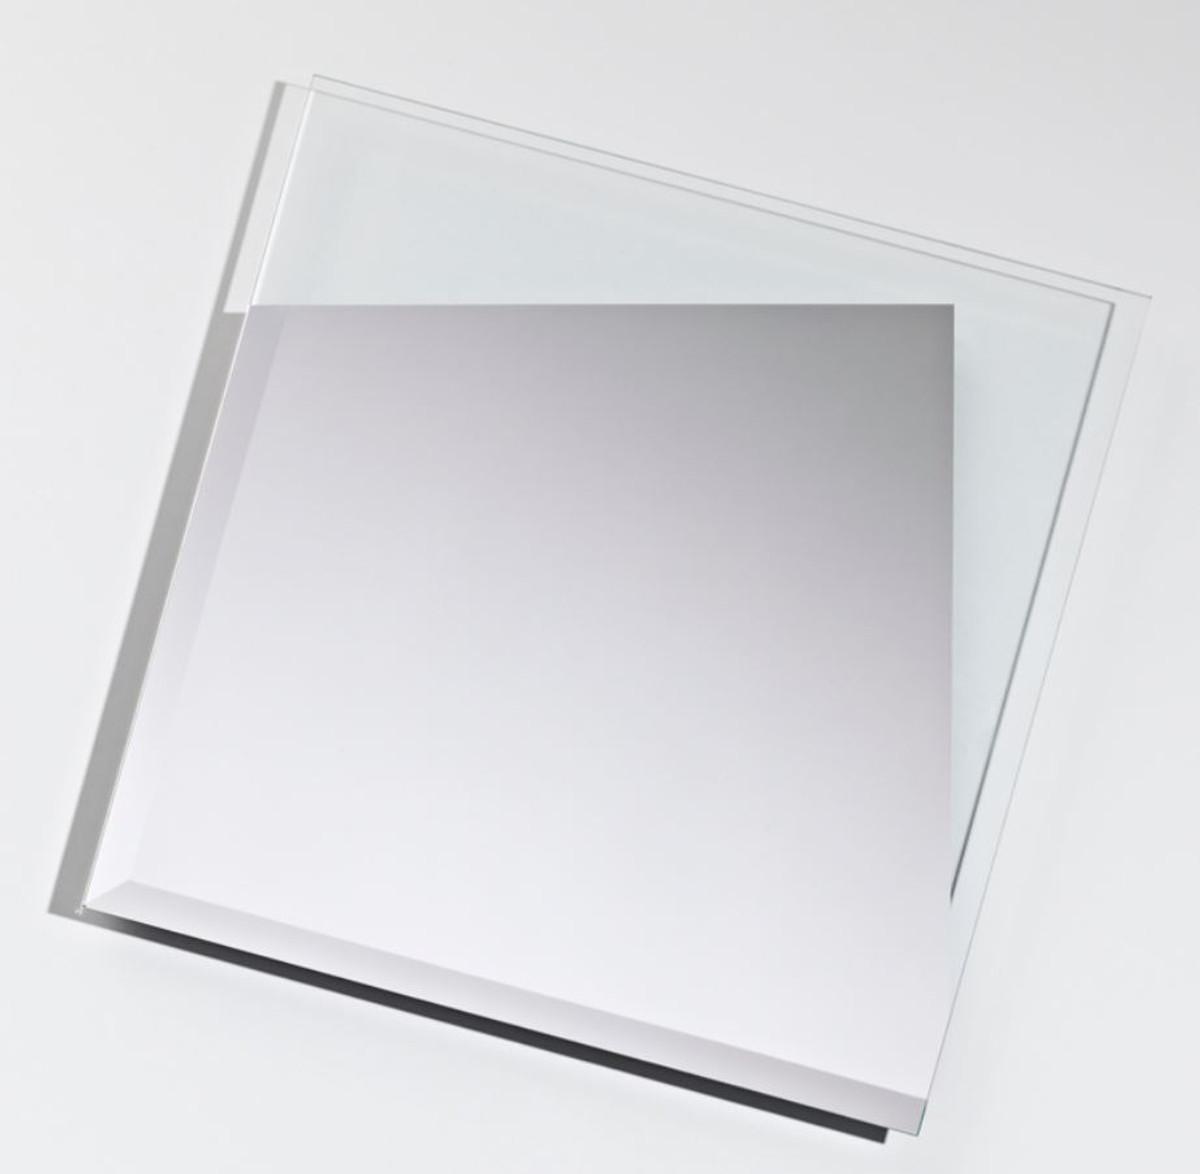 casa padrino designer wandspiegel 45 x h 45 cm designerm bel spiegel luxus spiegel luxus. Black Bedroom Furniture Sets. Home Design Ideas